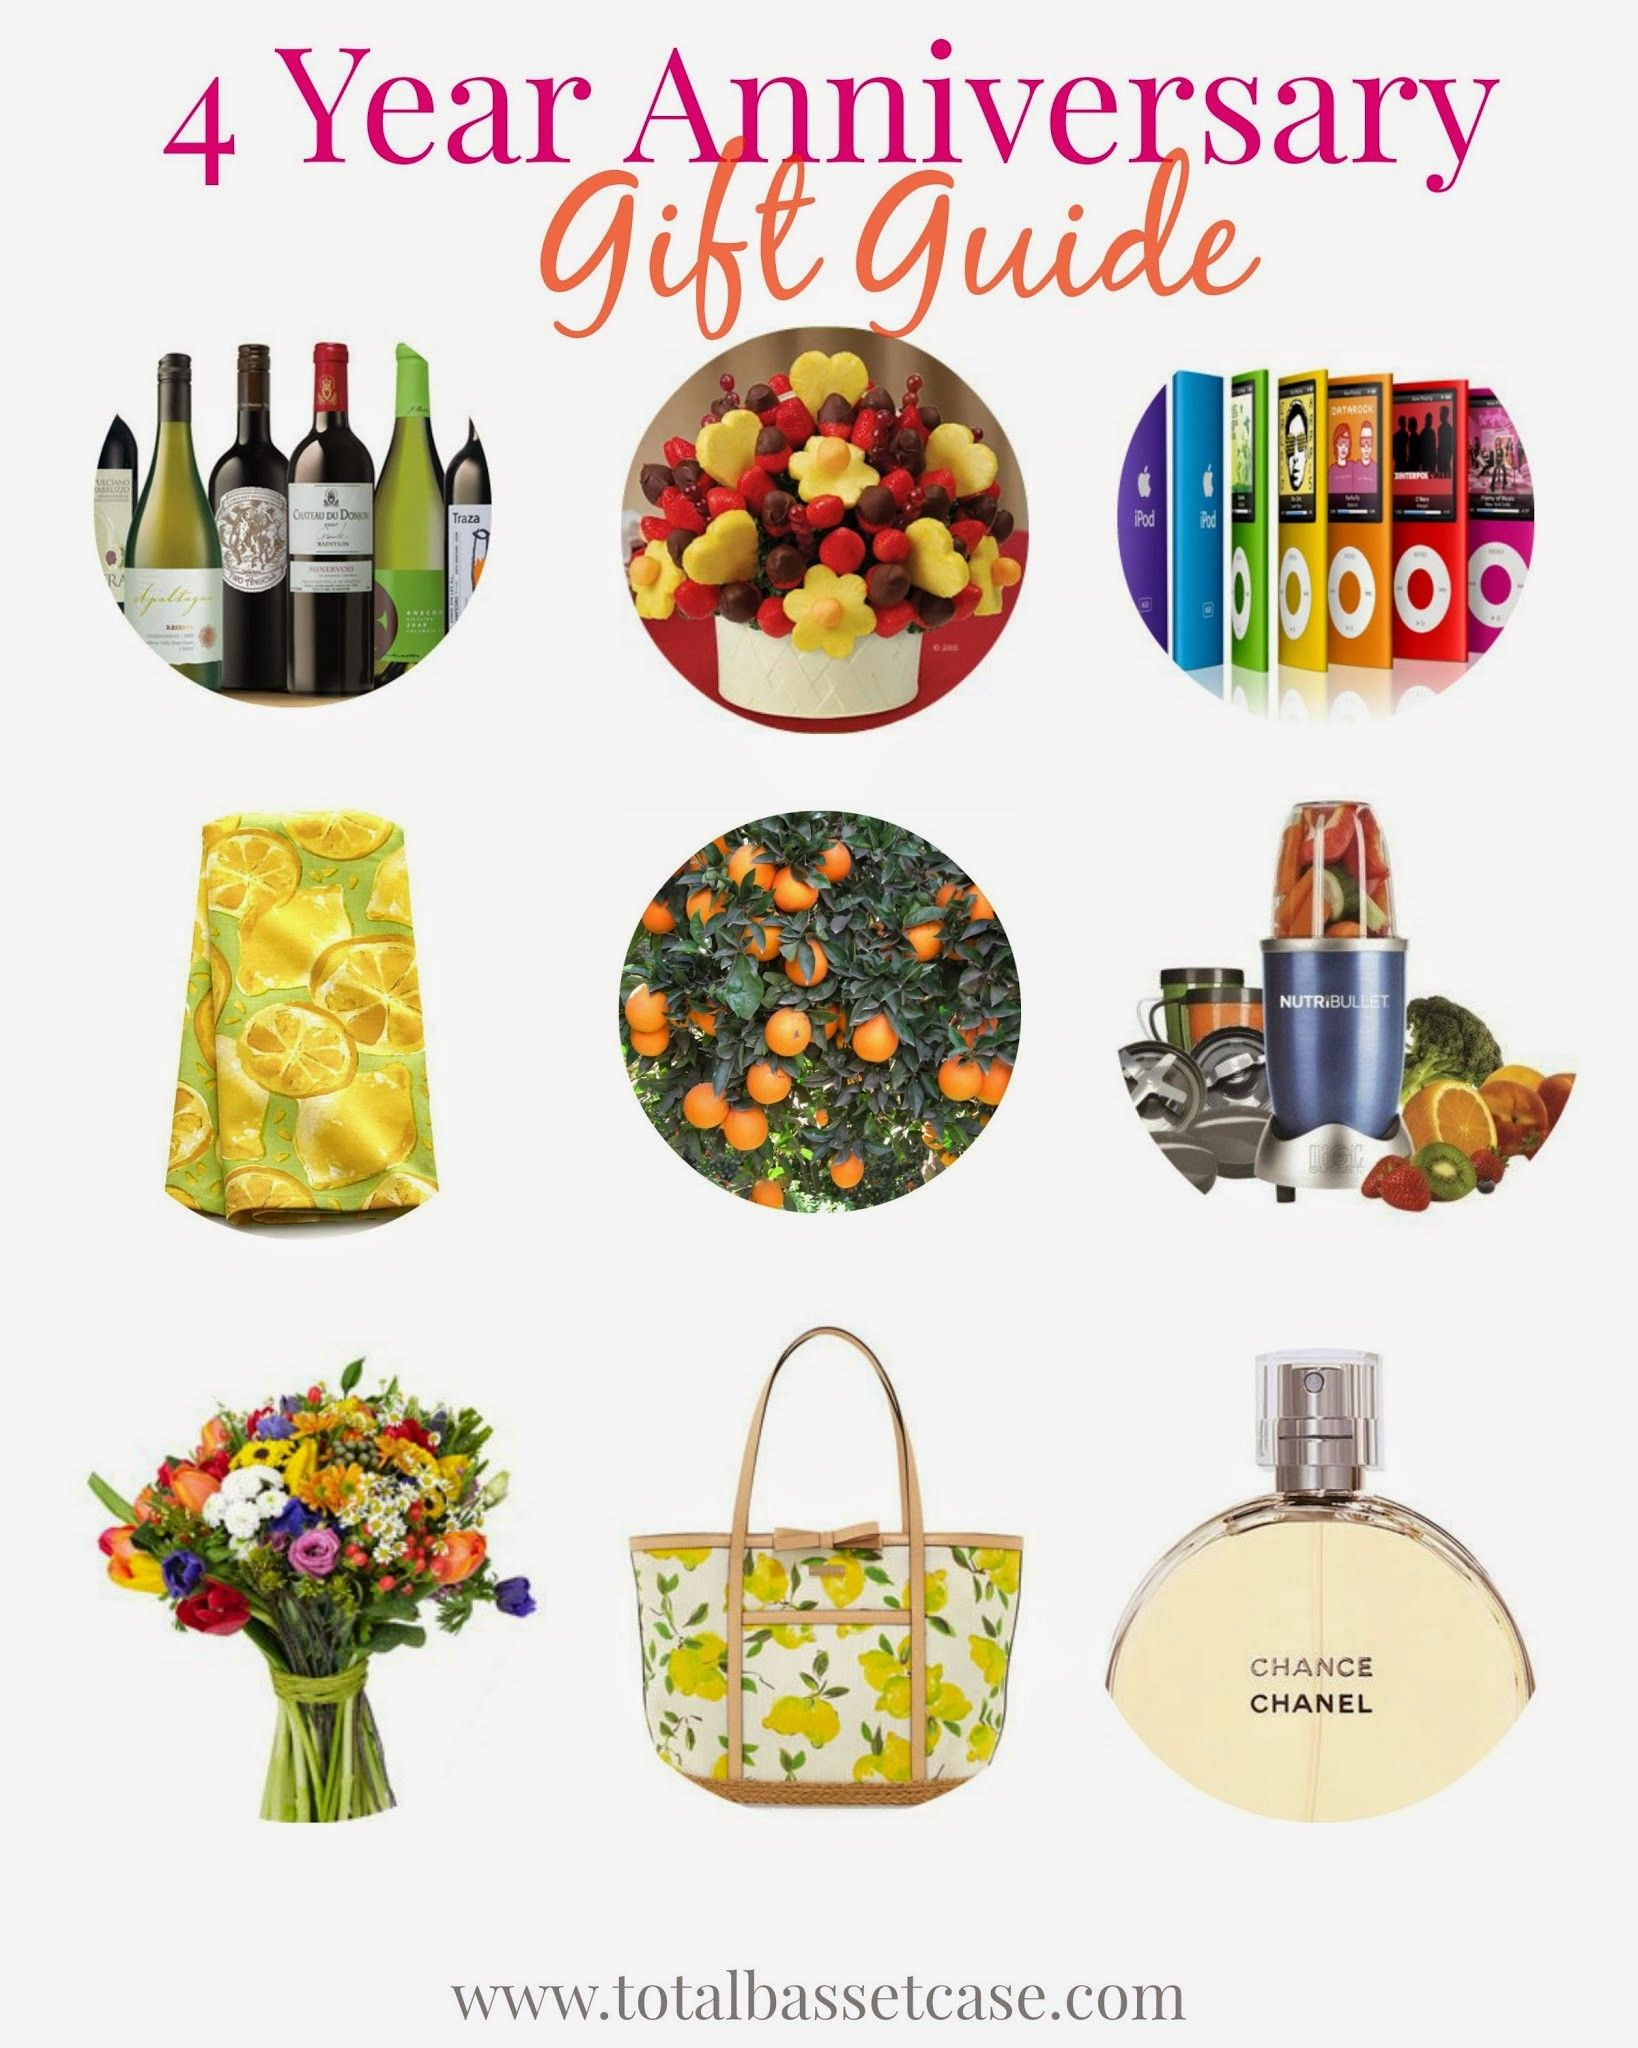 Total Basset Case Fruit Flowers 4 Year Anniversary Gift Guide 4th Wedding Anniversary Gift 4 Year Anniversary Anniversary Gifts